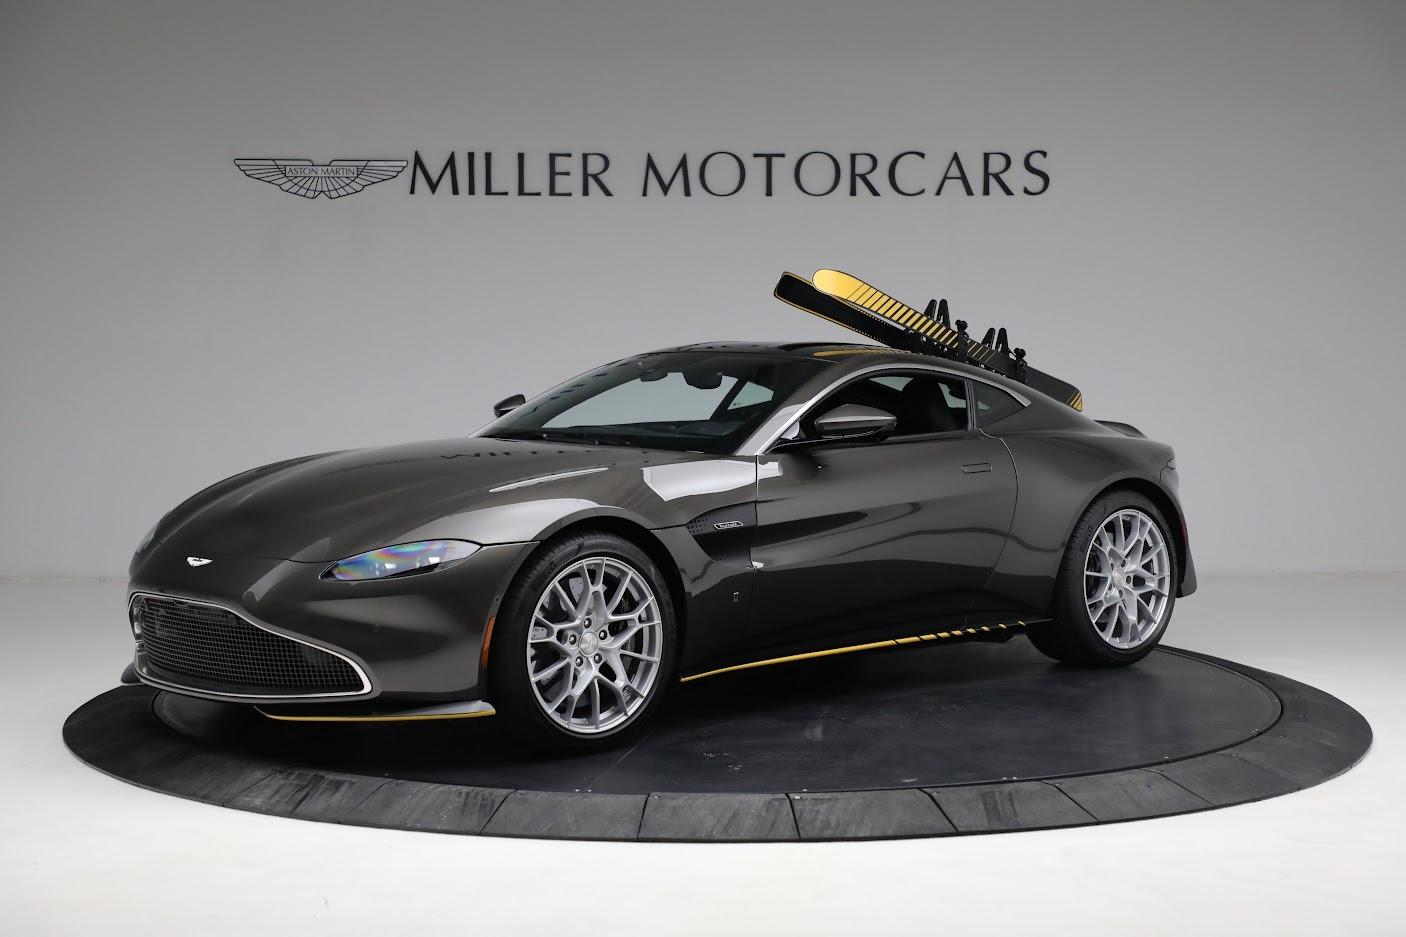 Used 2021 Aston Martin Vantage 007 Bond Edition for sale Sold at Bugatti of Greenwich in Greenwich CT 06830 1